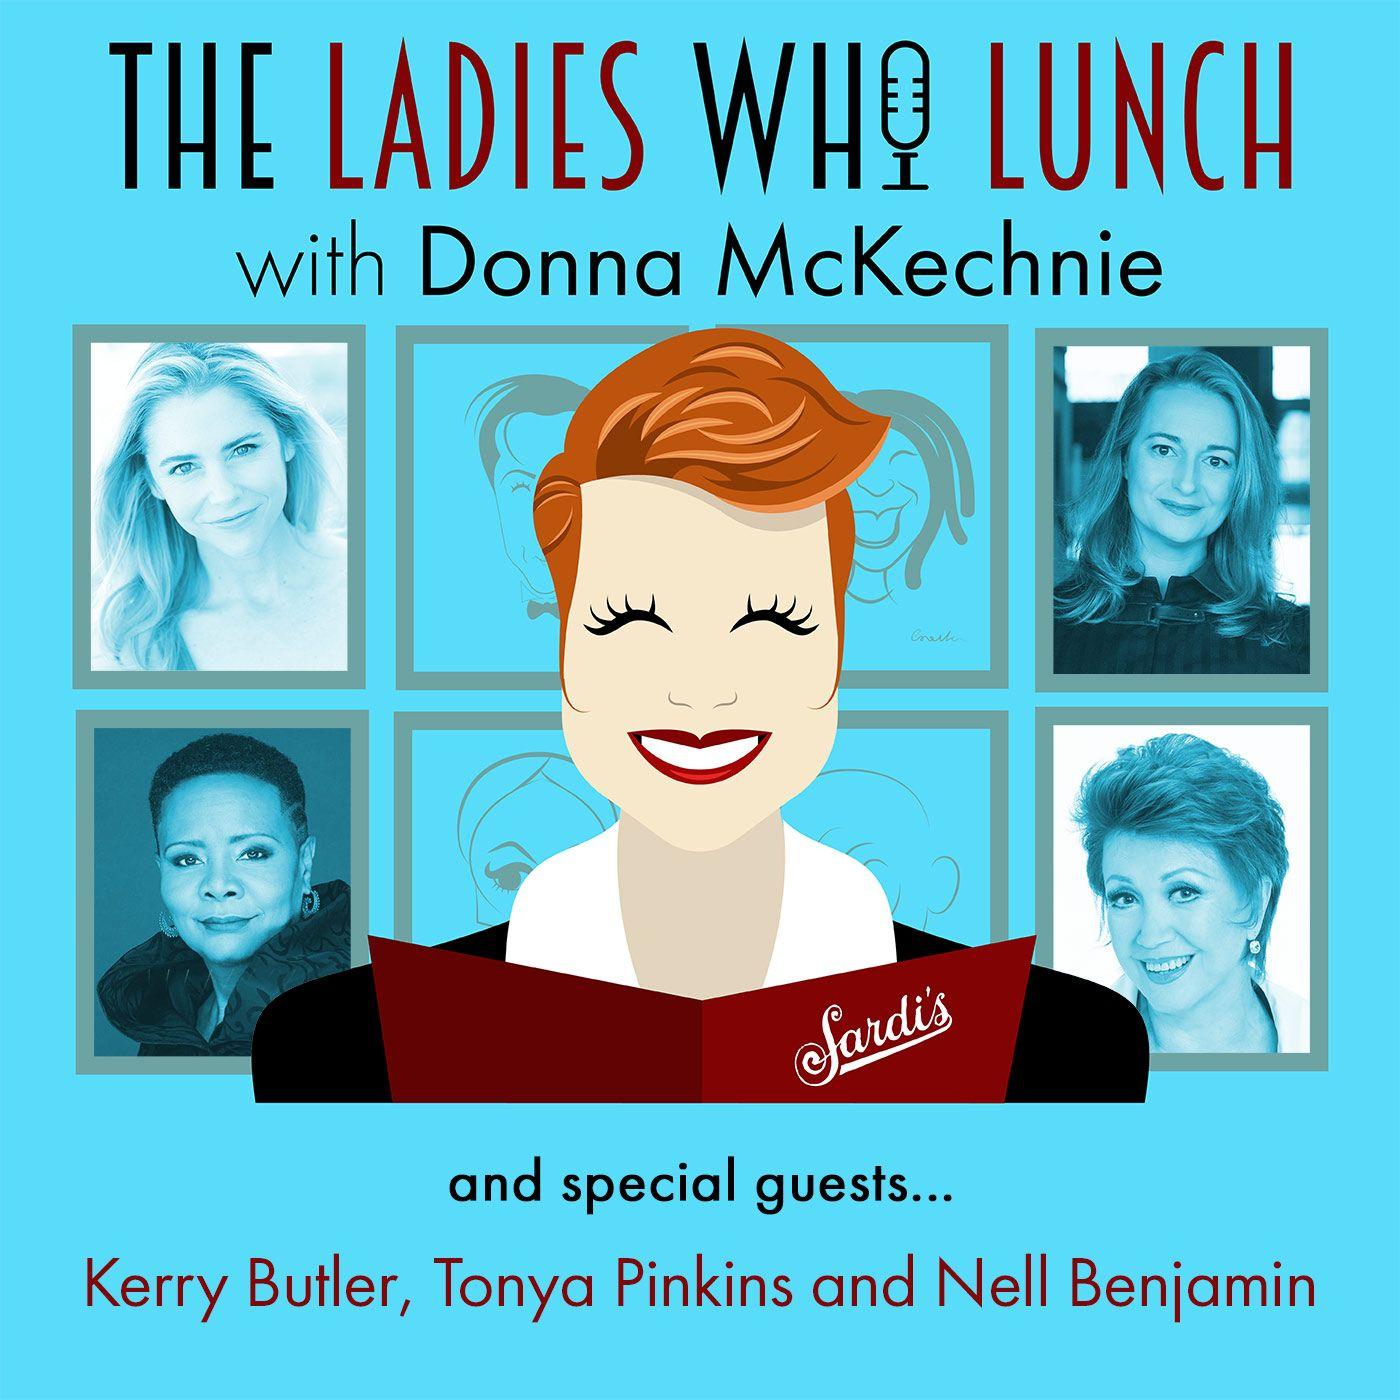 #6 - Kerry Butler, Tonya Pinkins, and Nell Benjamin